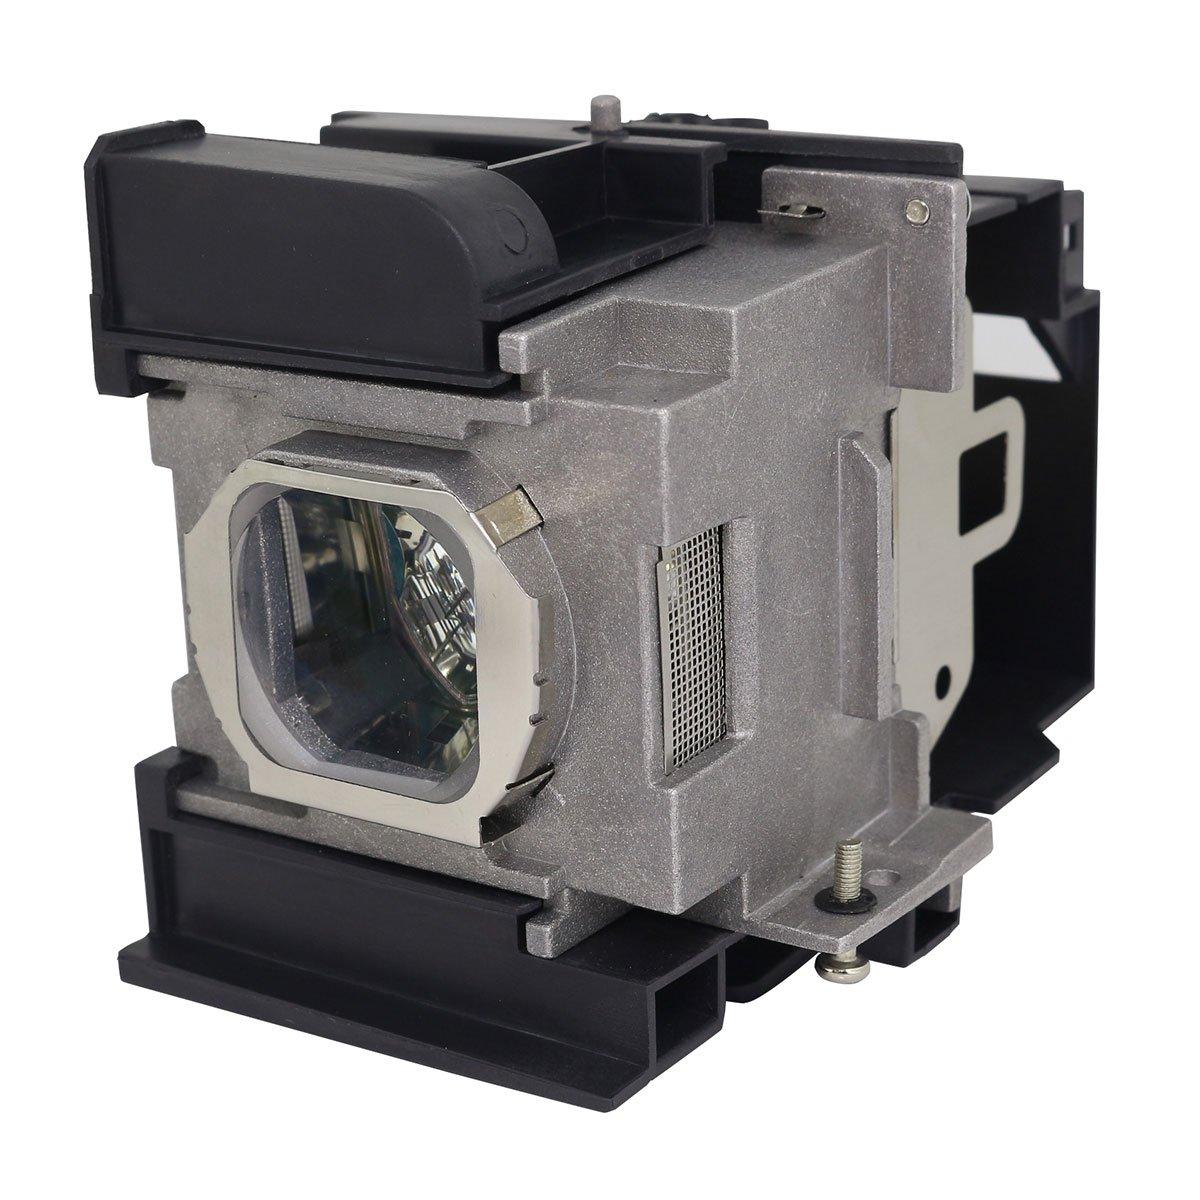 Lutema Platinum for Panasonic PT-AR100 Projector Lamp with Housing (Original Philips Bulb Inside)